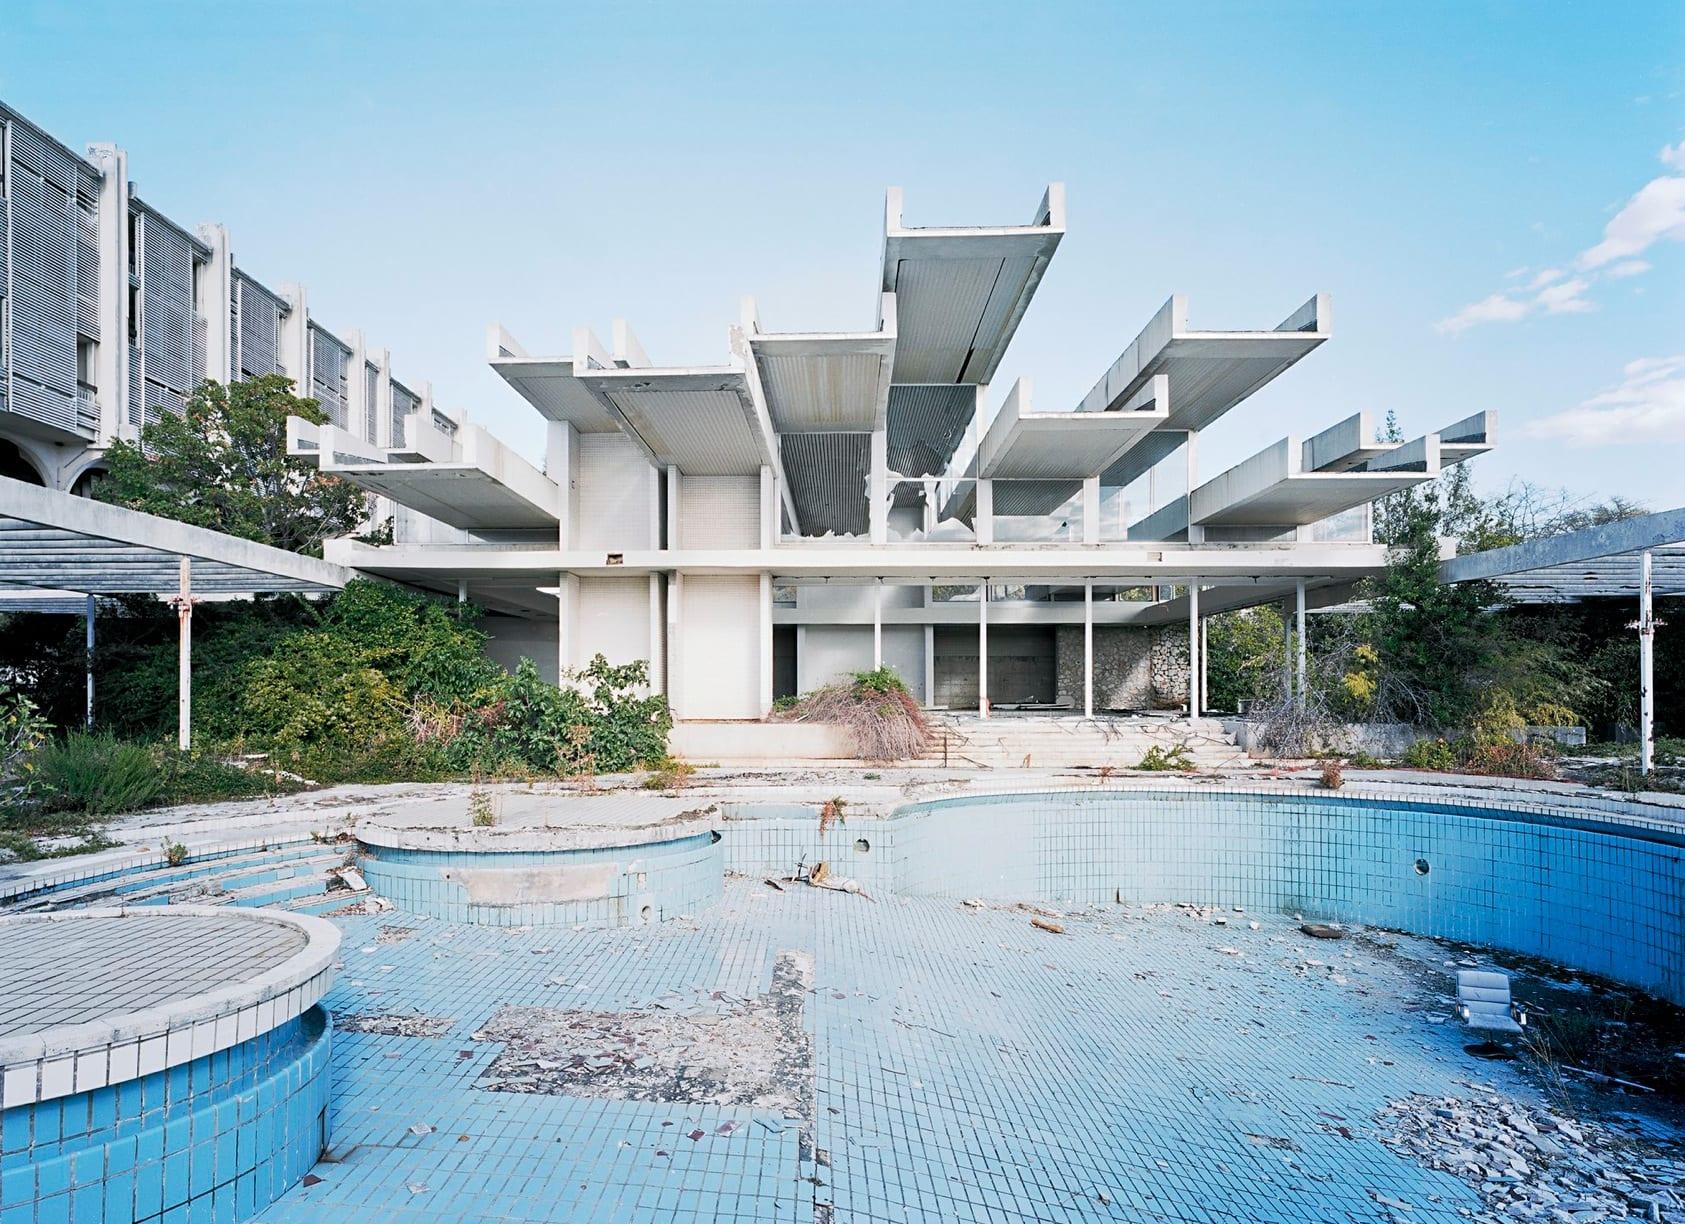 Villa Dolomites With Pool